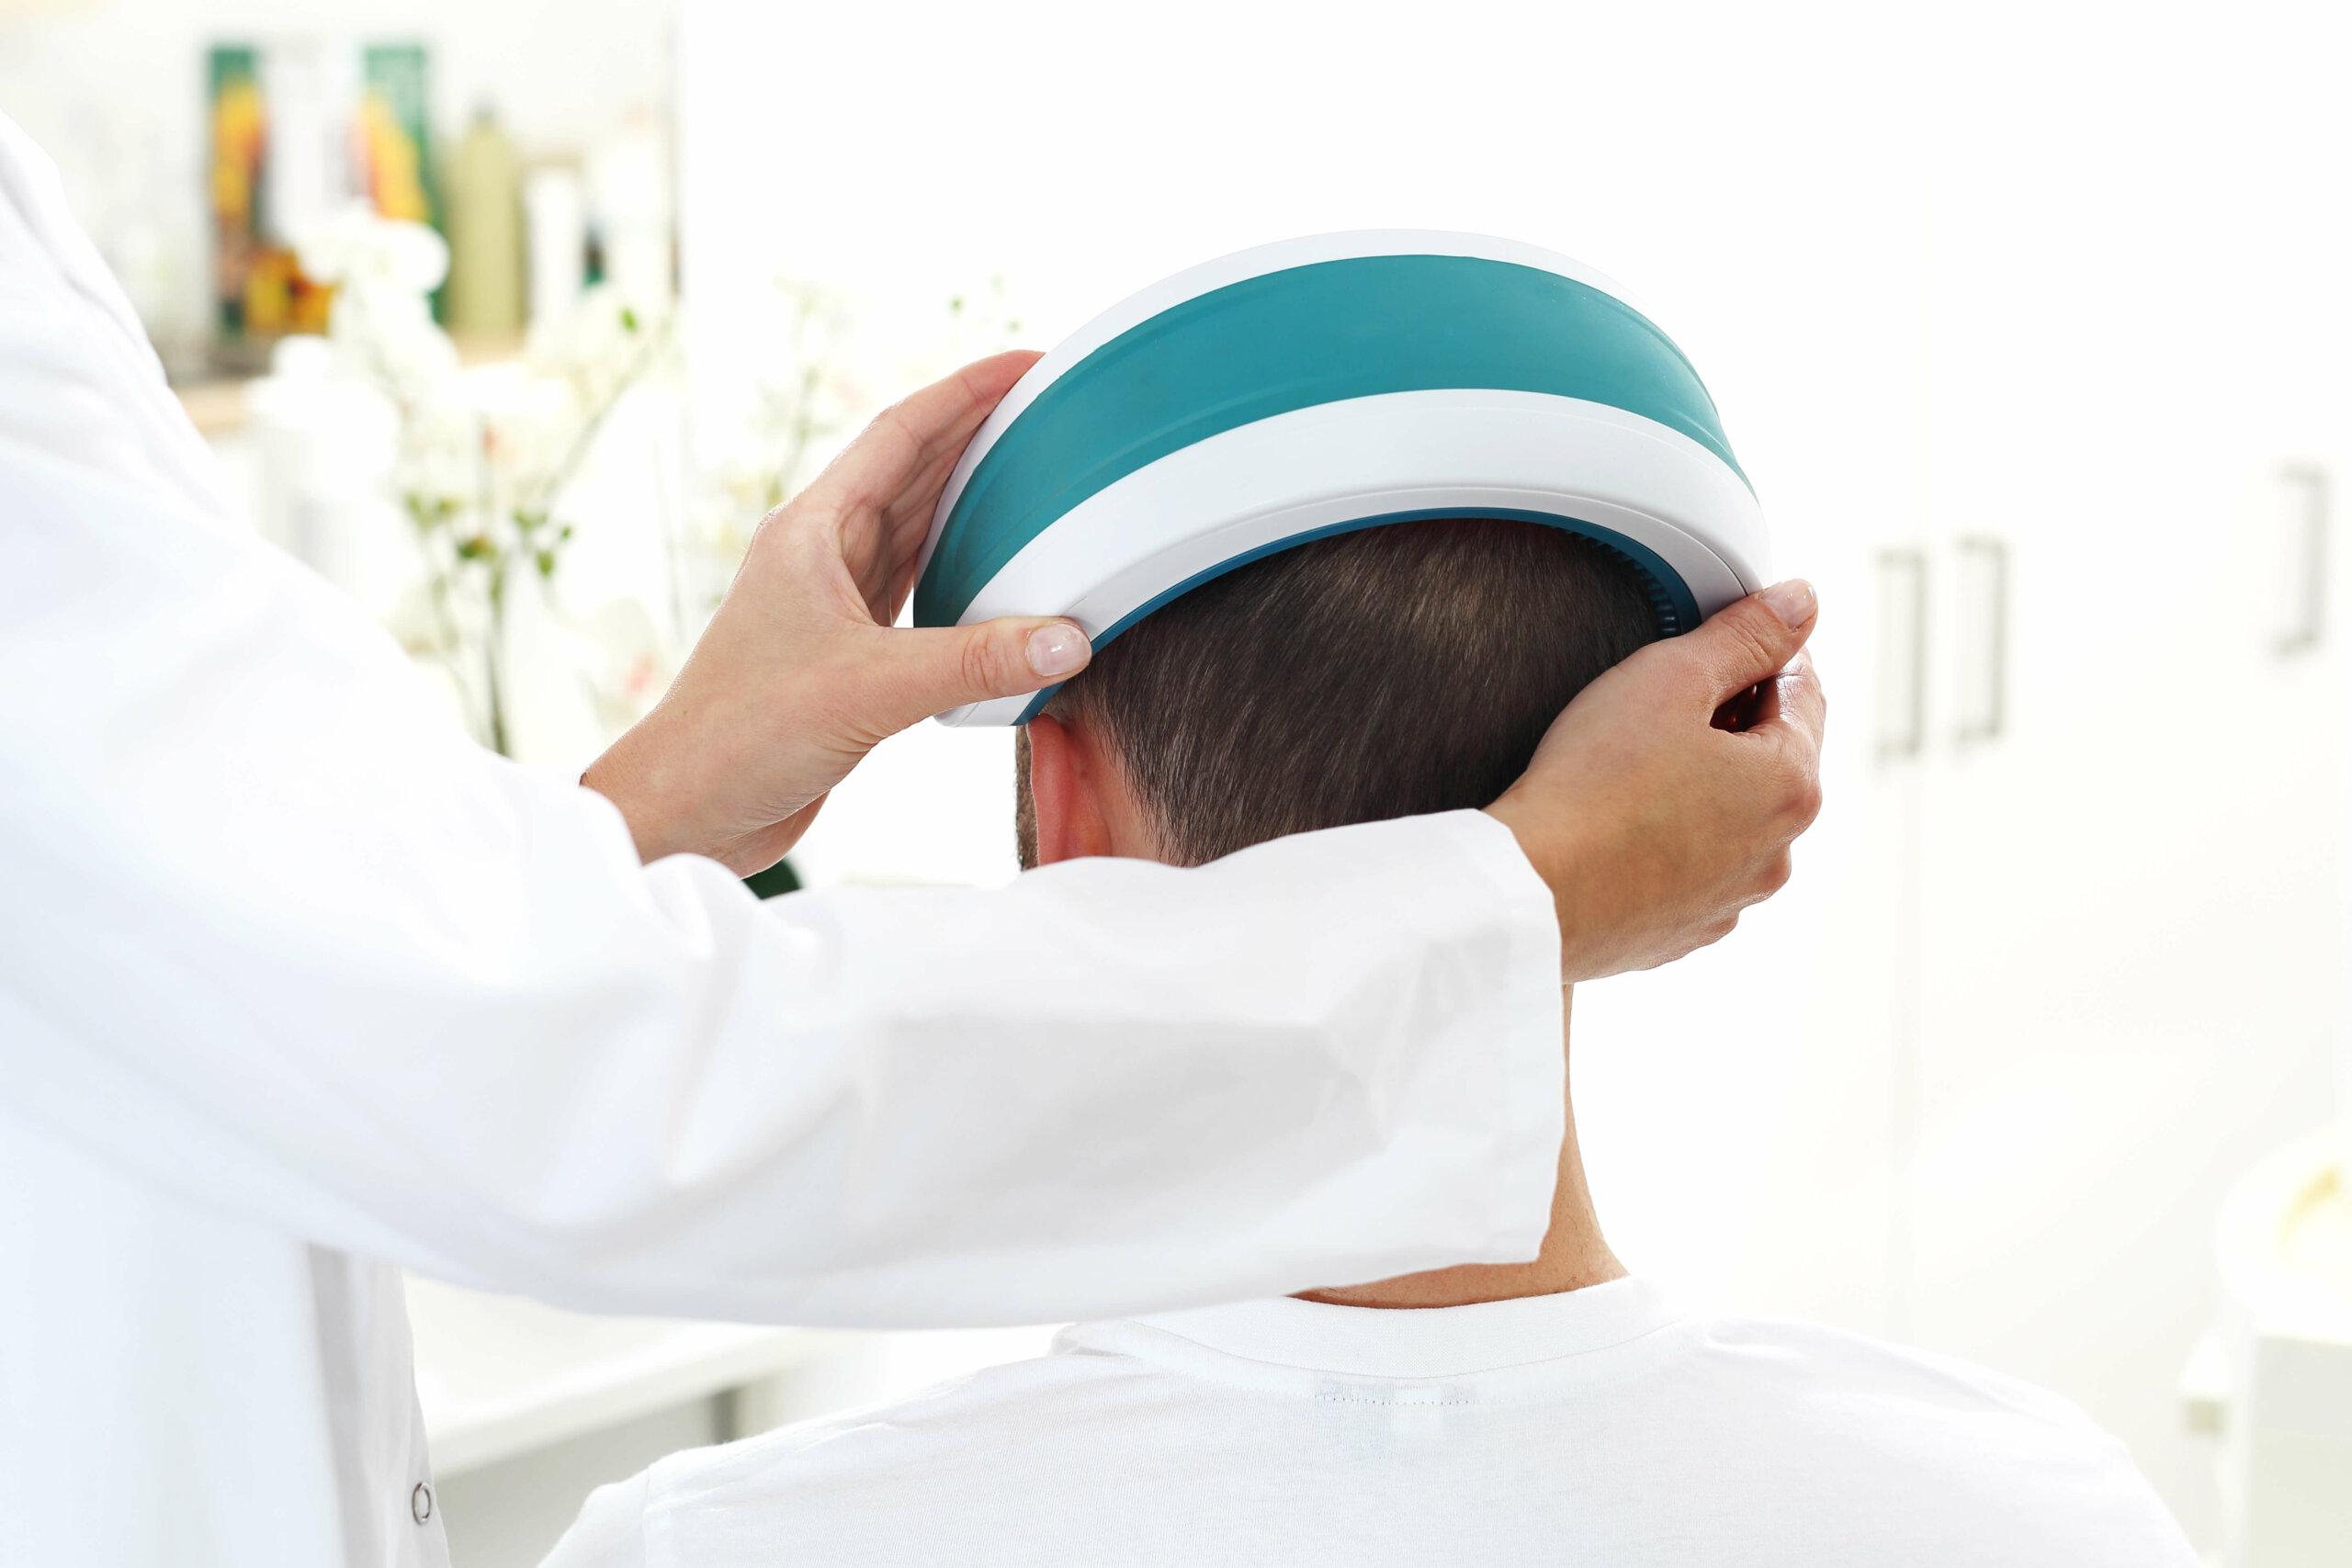 A medical professional applying an LLLT headband to a man's head